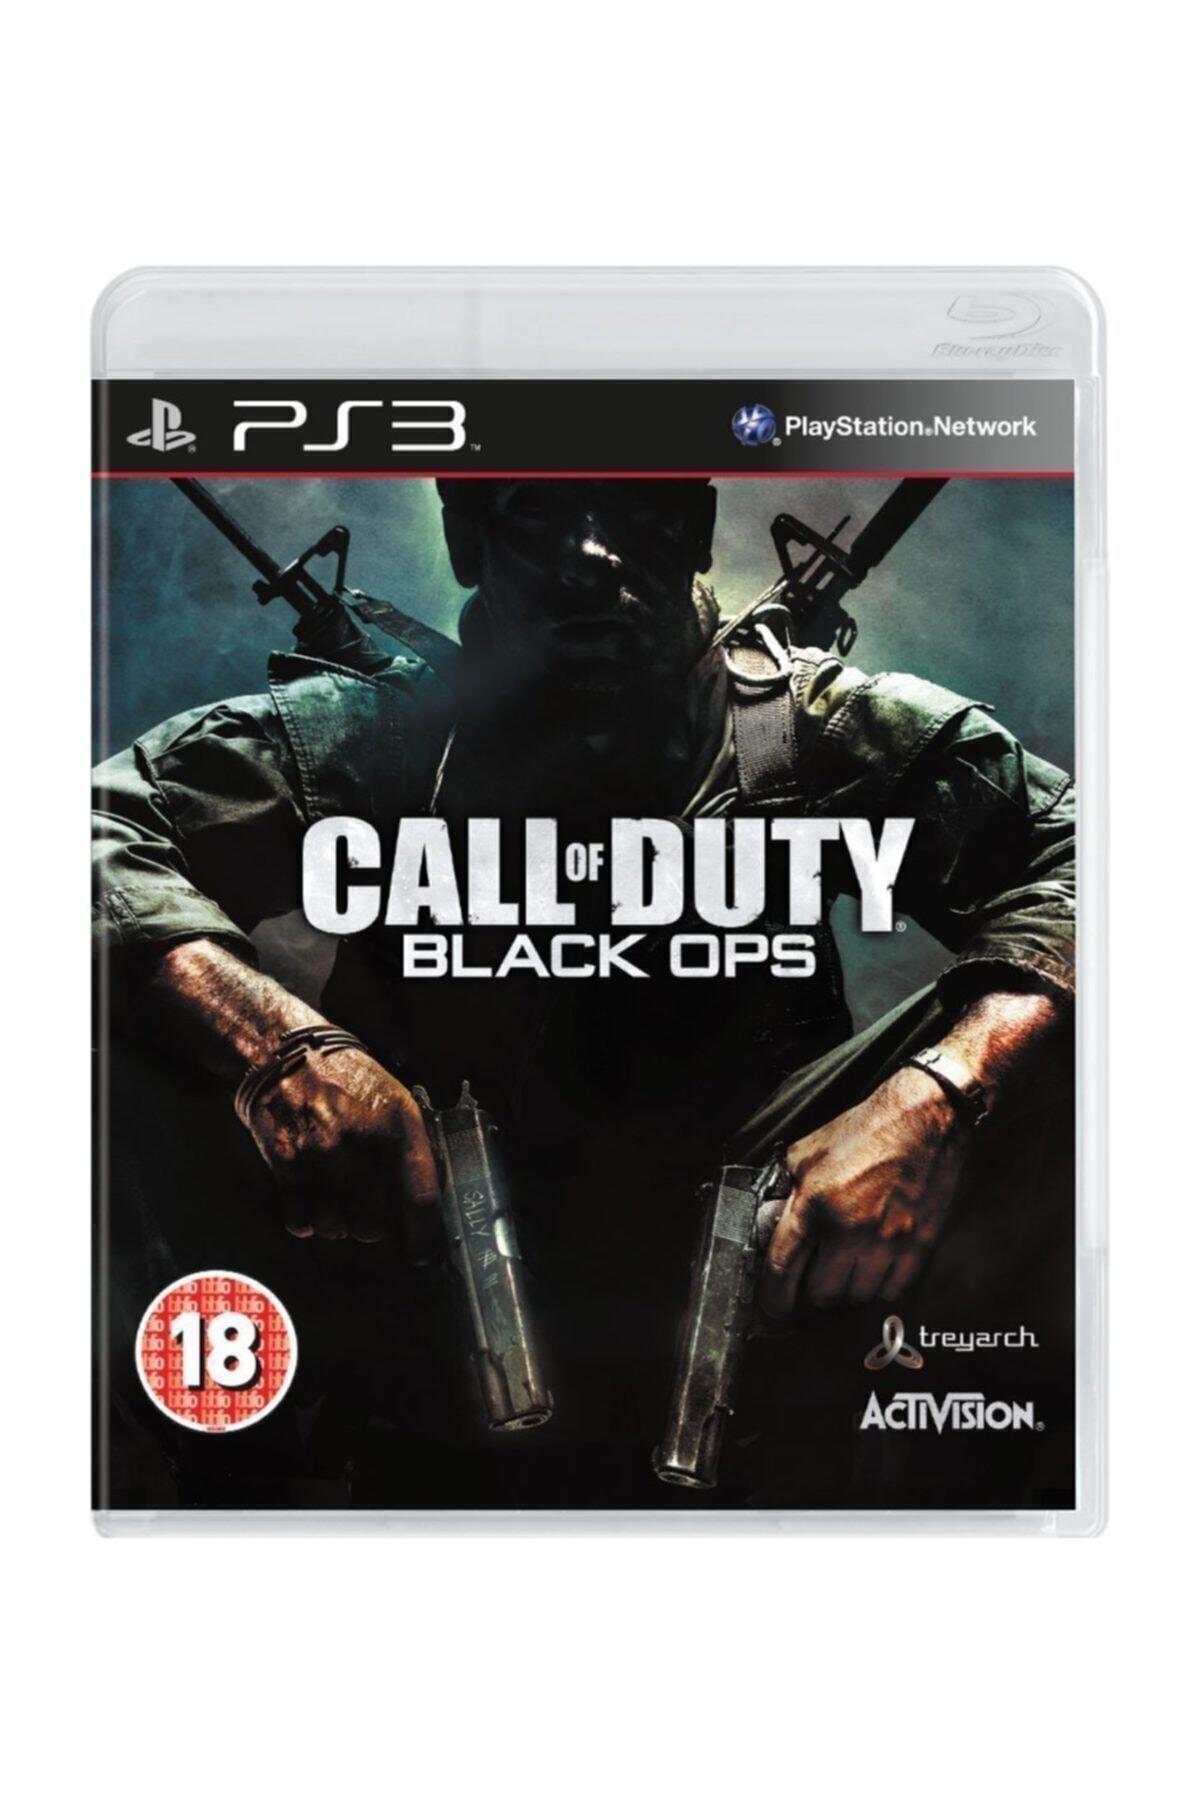 ACTIVISION Playstation 3 Oyunu Almanca Menü ( Call Of Duty Black Ops Ps3 ) Oyun 1